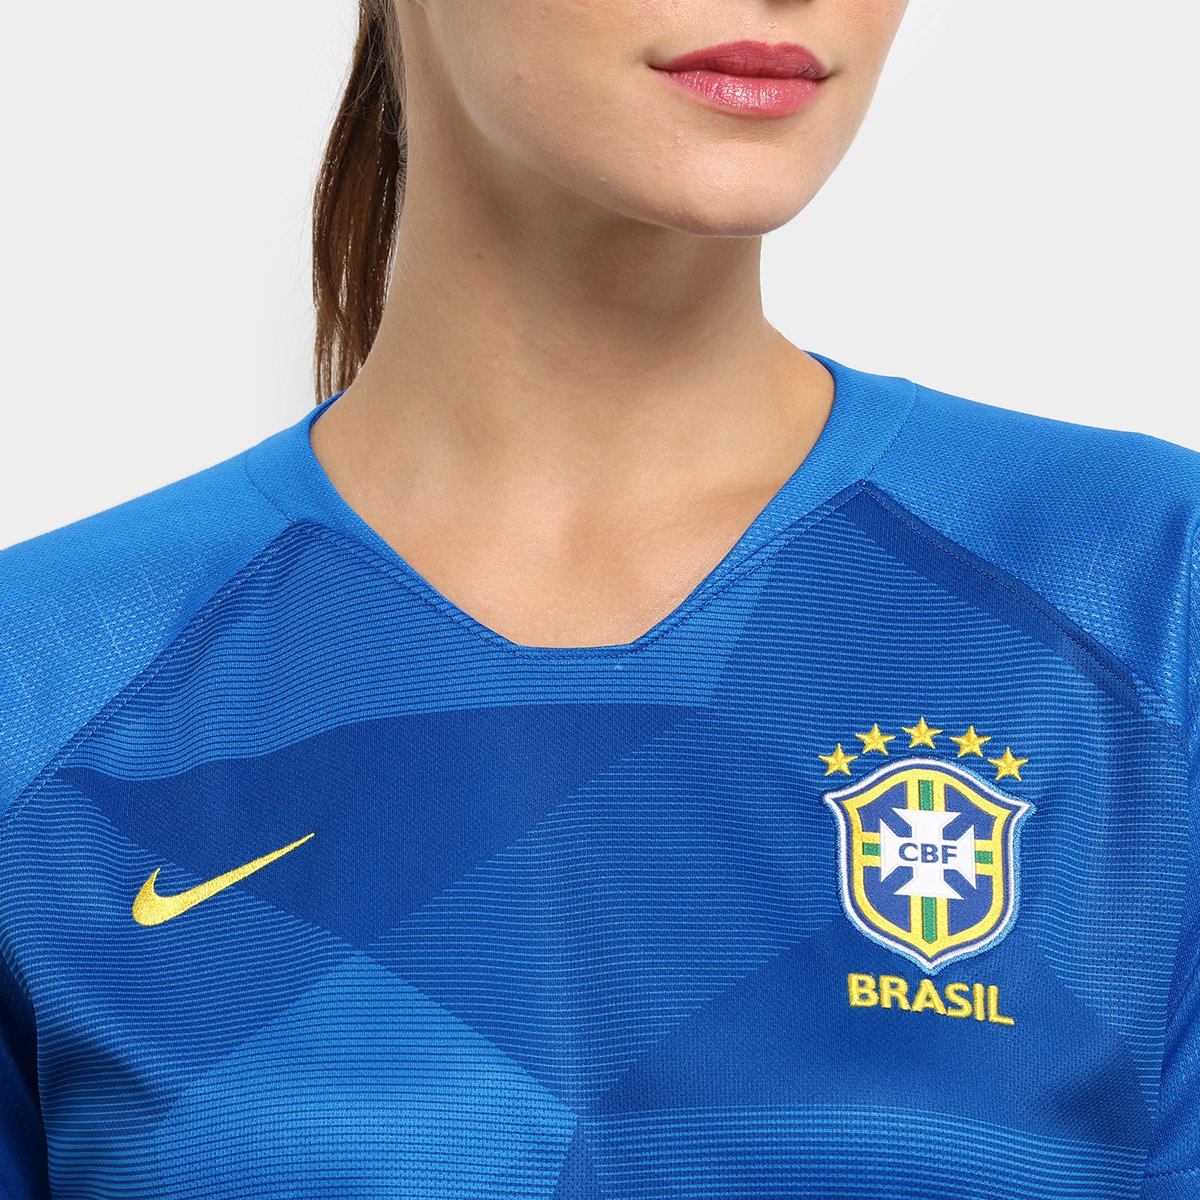 bd77fc24cb CAMISA MANGA CURTA CBF M NK BRT STAD JSY undefinedLoading zoom ... Camisa  Seleção Brasil II 2018 s n° - Torcedor Nike Feminina .